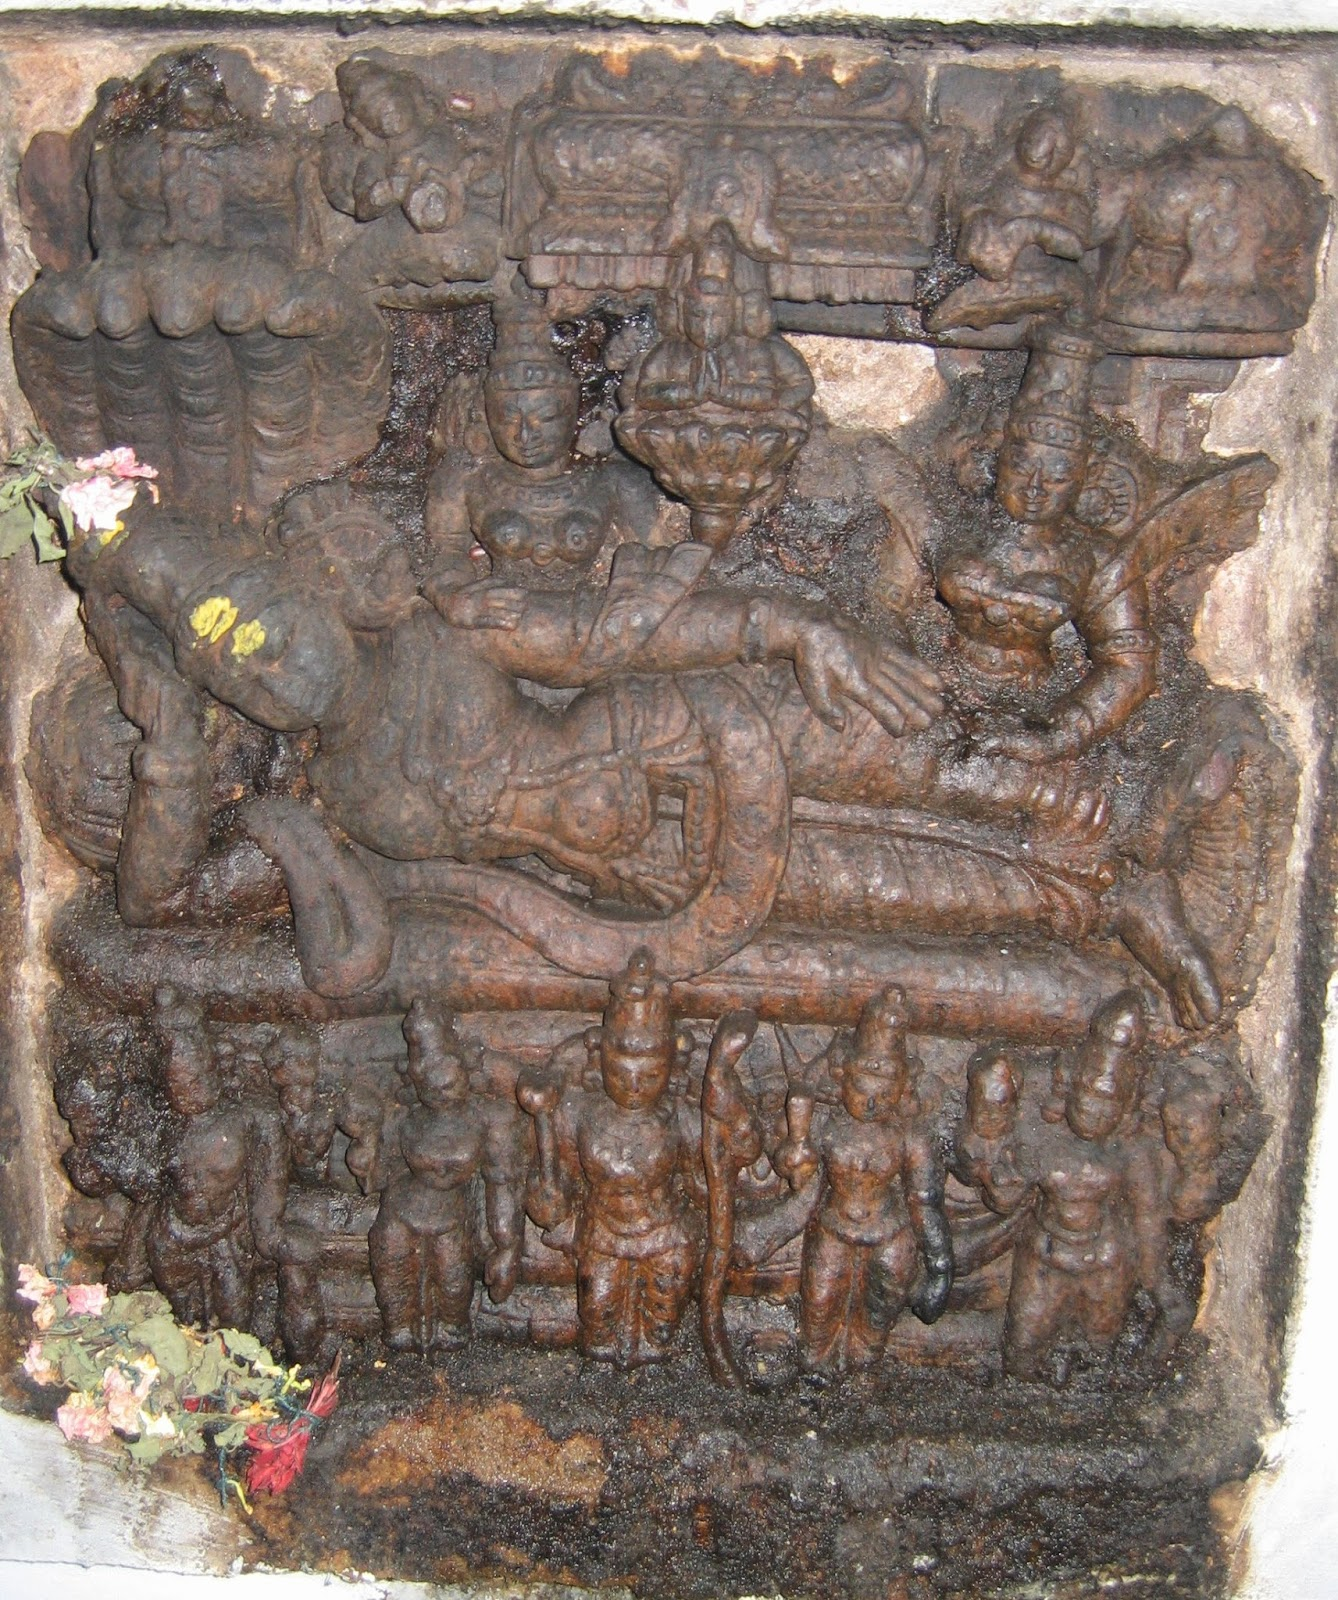 Temple travel and sport kothandarama gandharvakottai